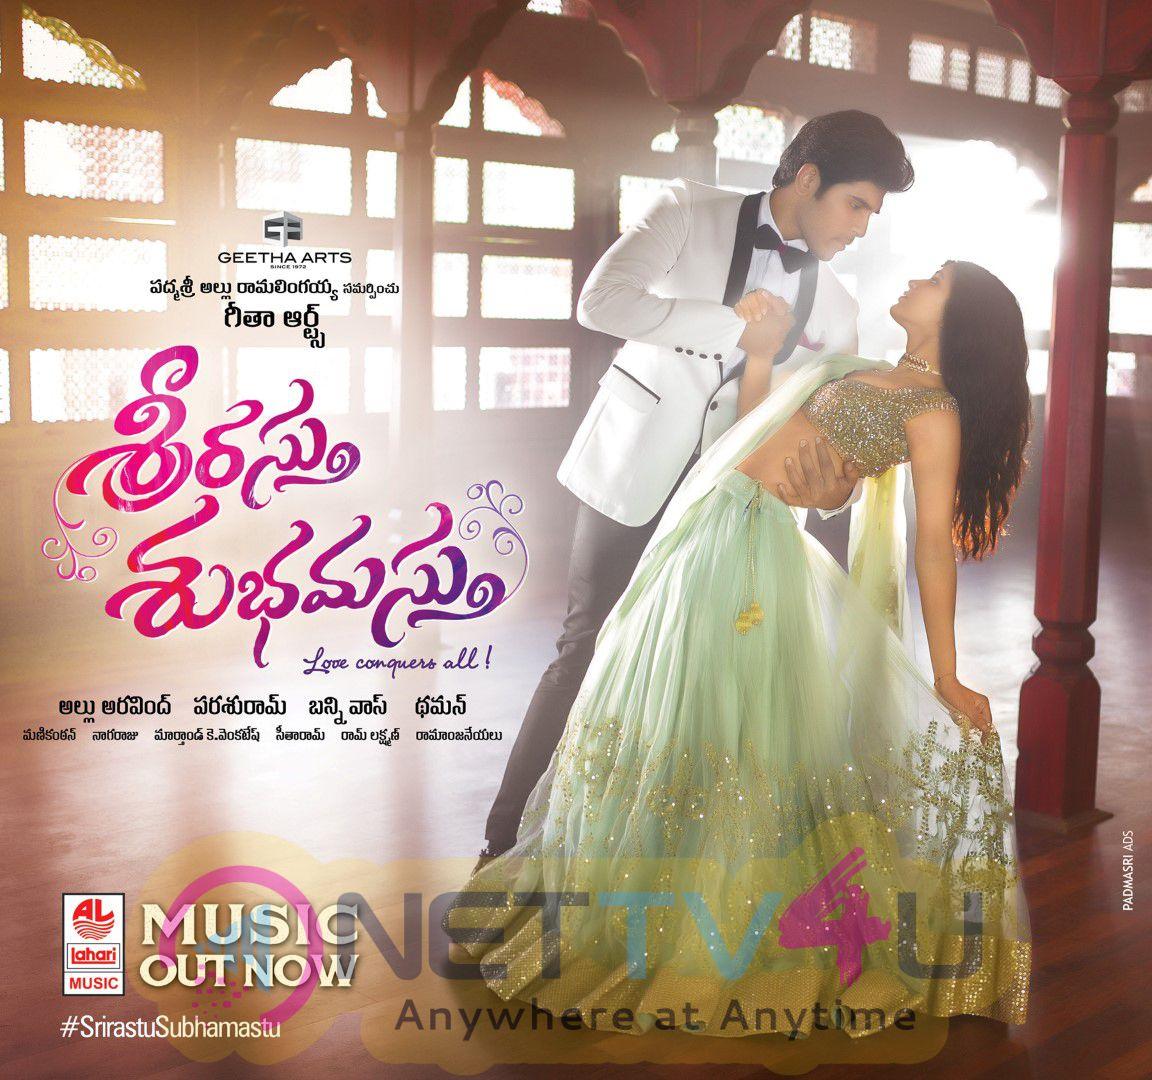 Srirastu Subhamastu Telugu Movie Audio Release Wallpapers